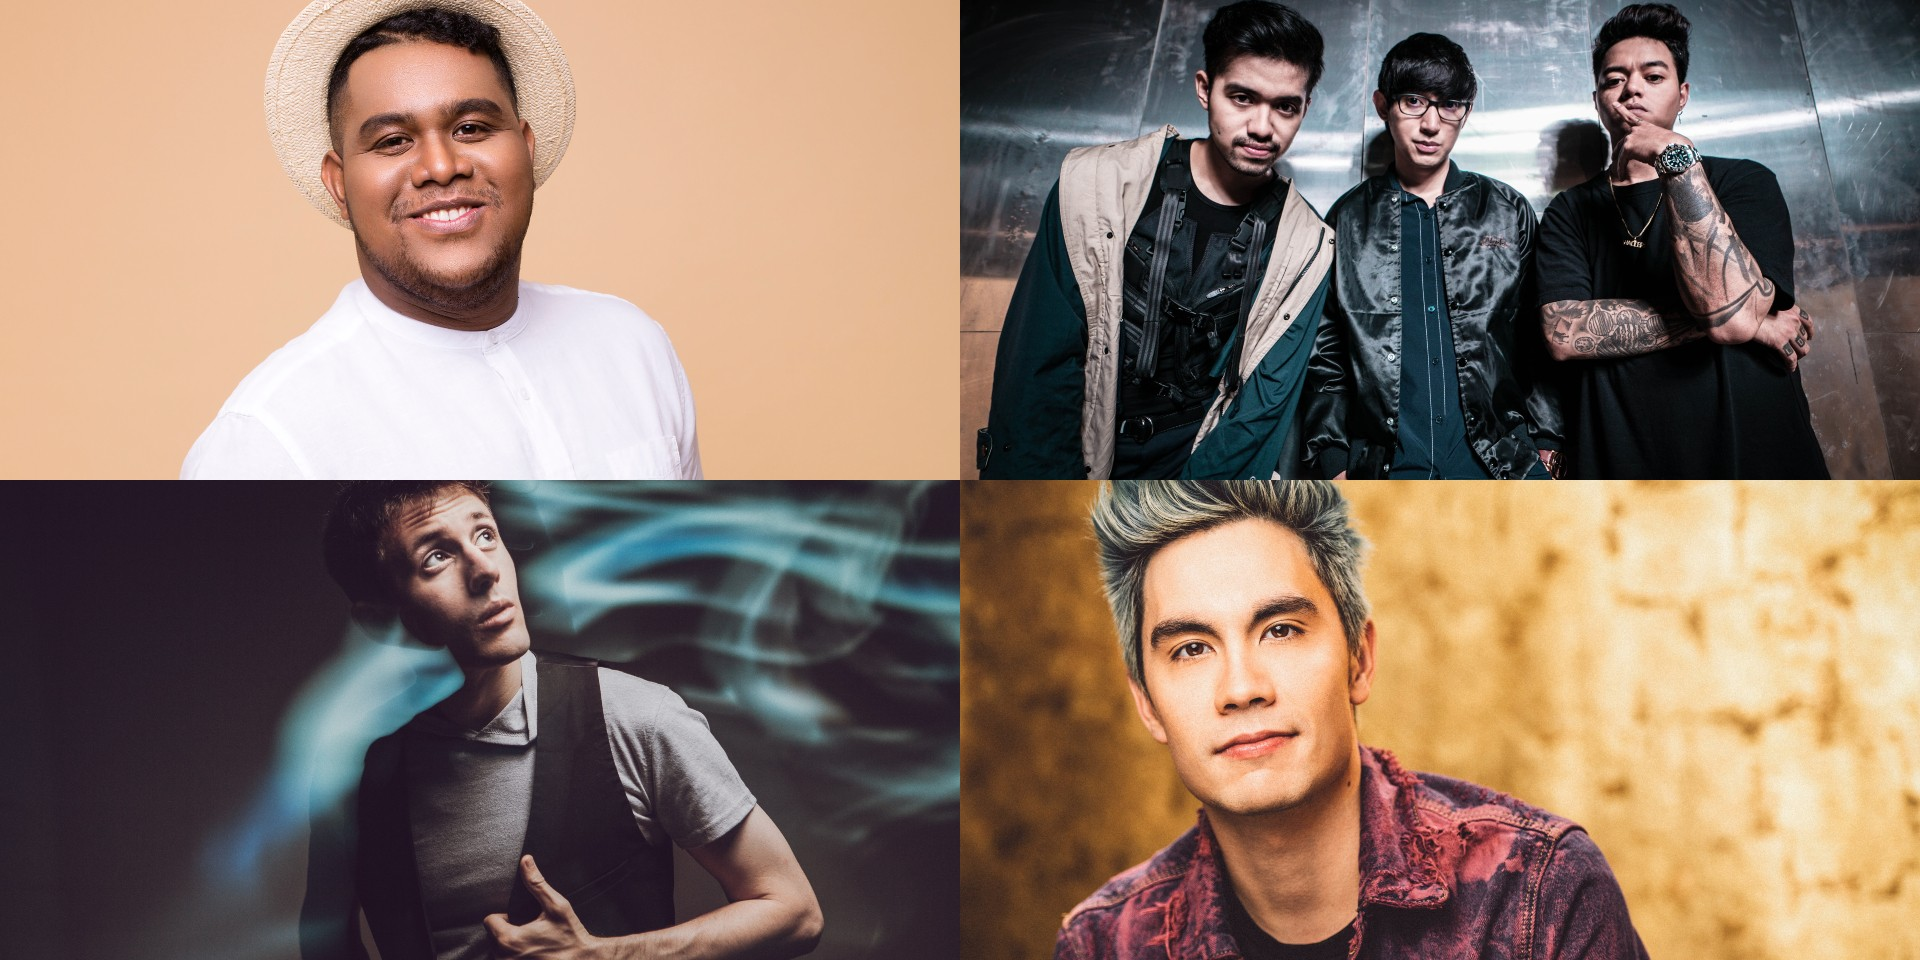 Explore Indonesia with Andmesh, Weird Genius, Kurt Hugo Schneider, Sam Tsui, and more at Music Matters from Wonderful Indonesia